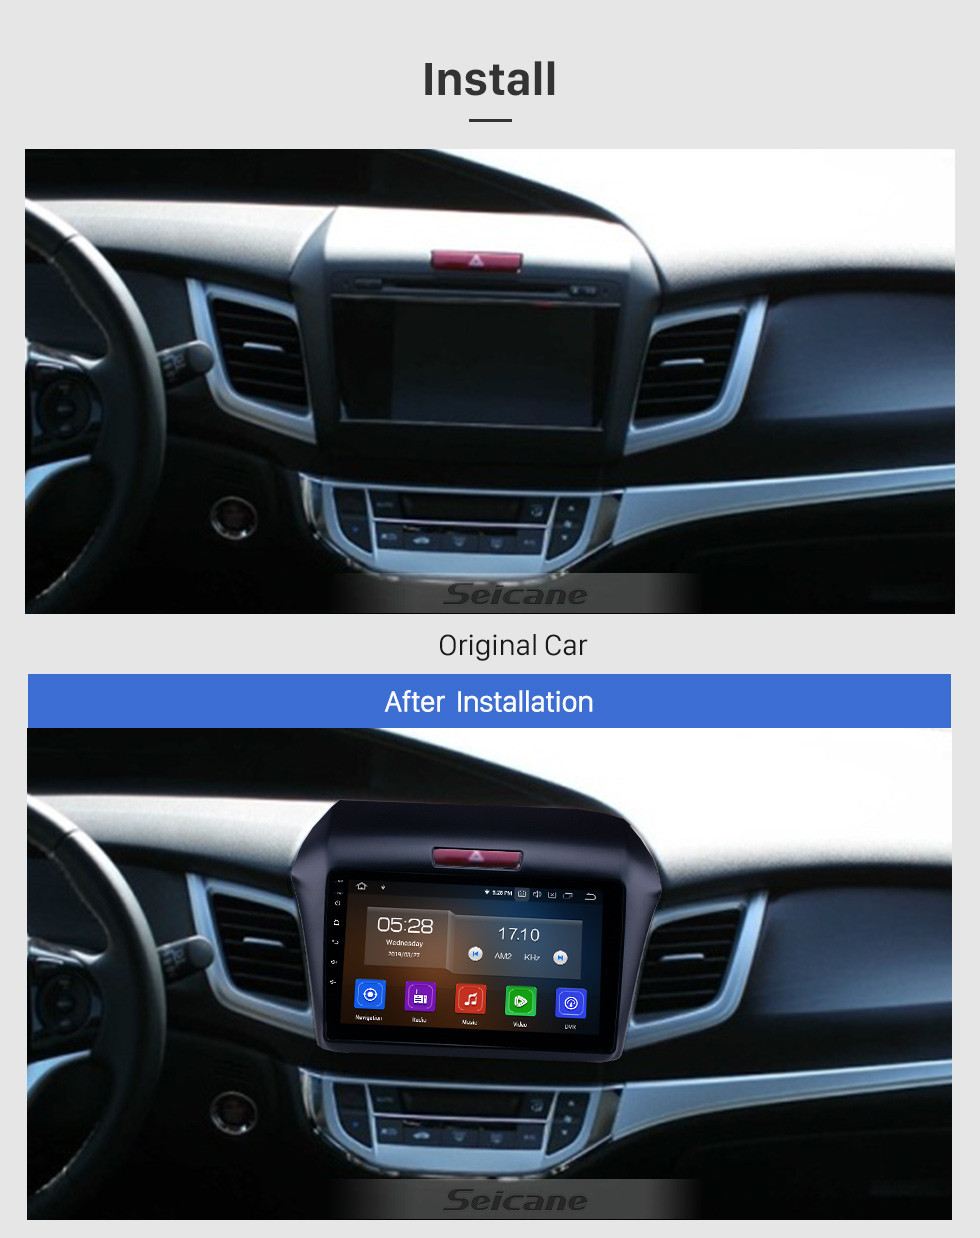 Seicane 2013 Honda Jade Android 10.0 9 inch GPS Navigation Radio HD Touchscreen Bluetooth USB WIFI Carplay support Digital TV DAB+